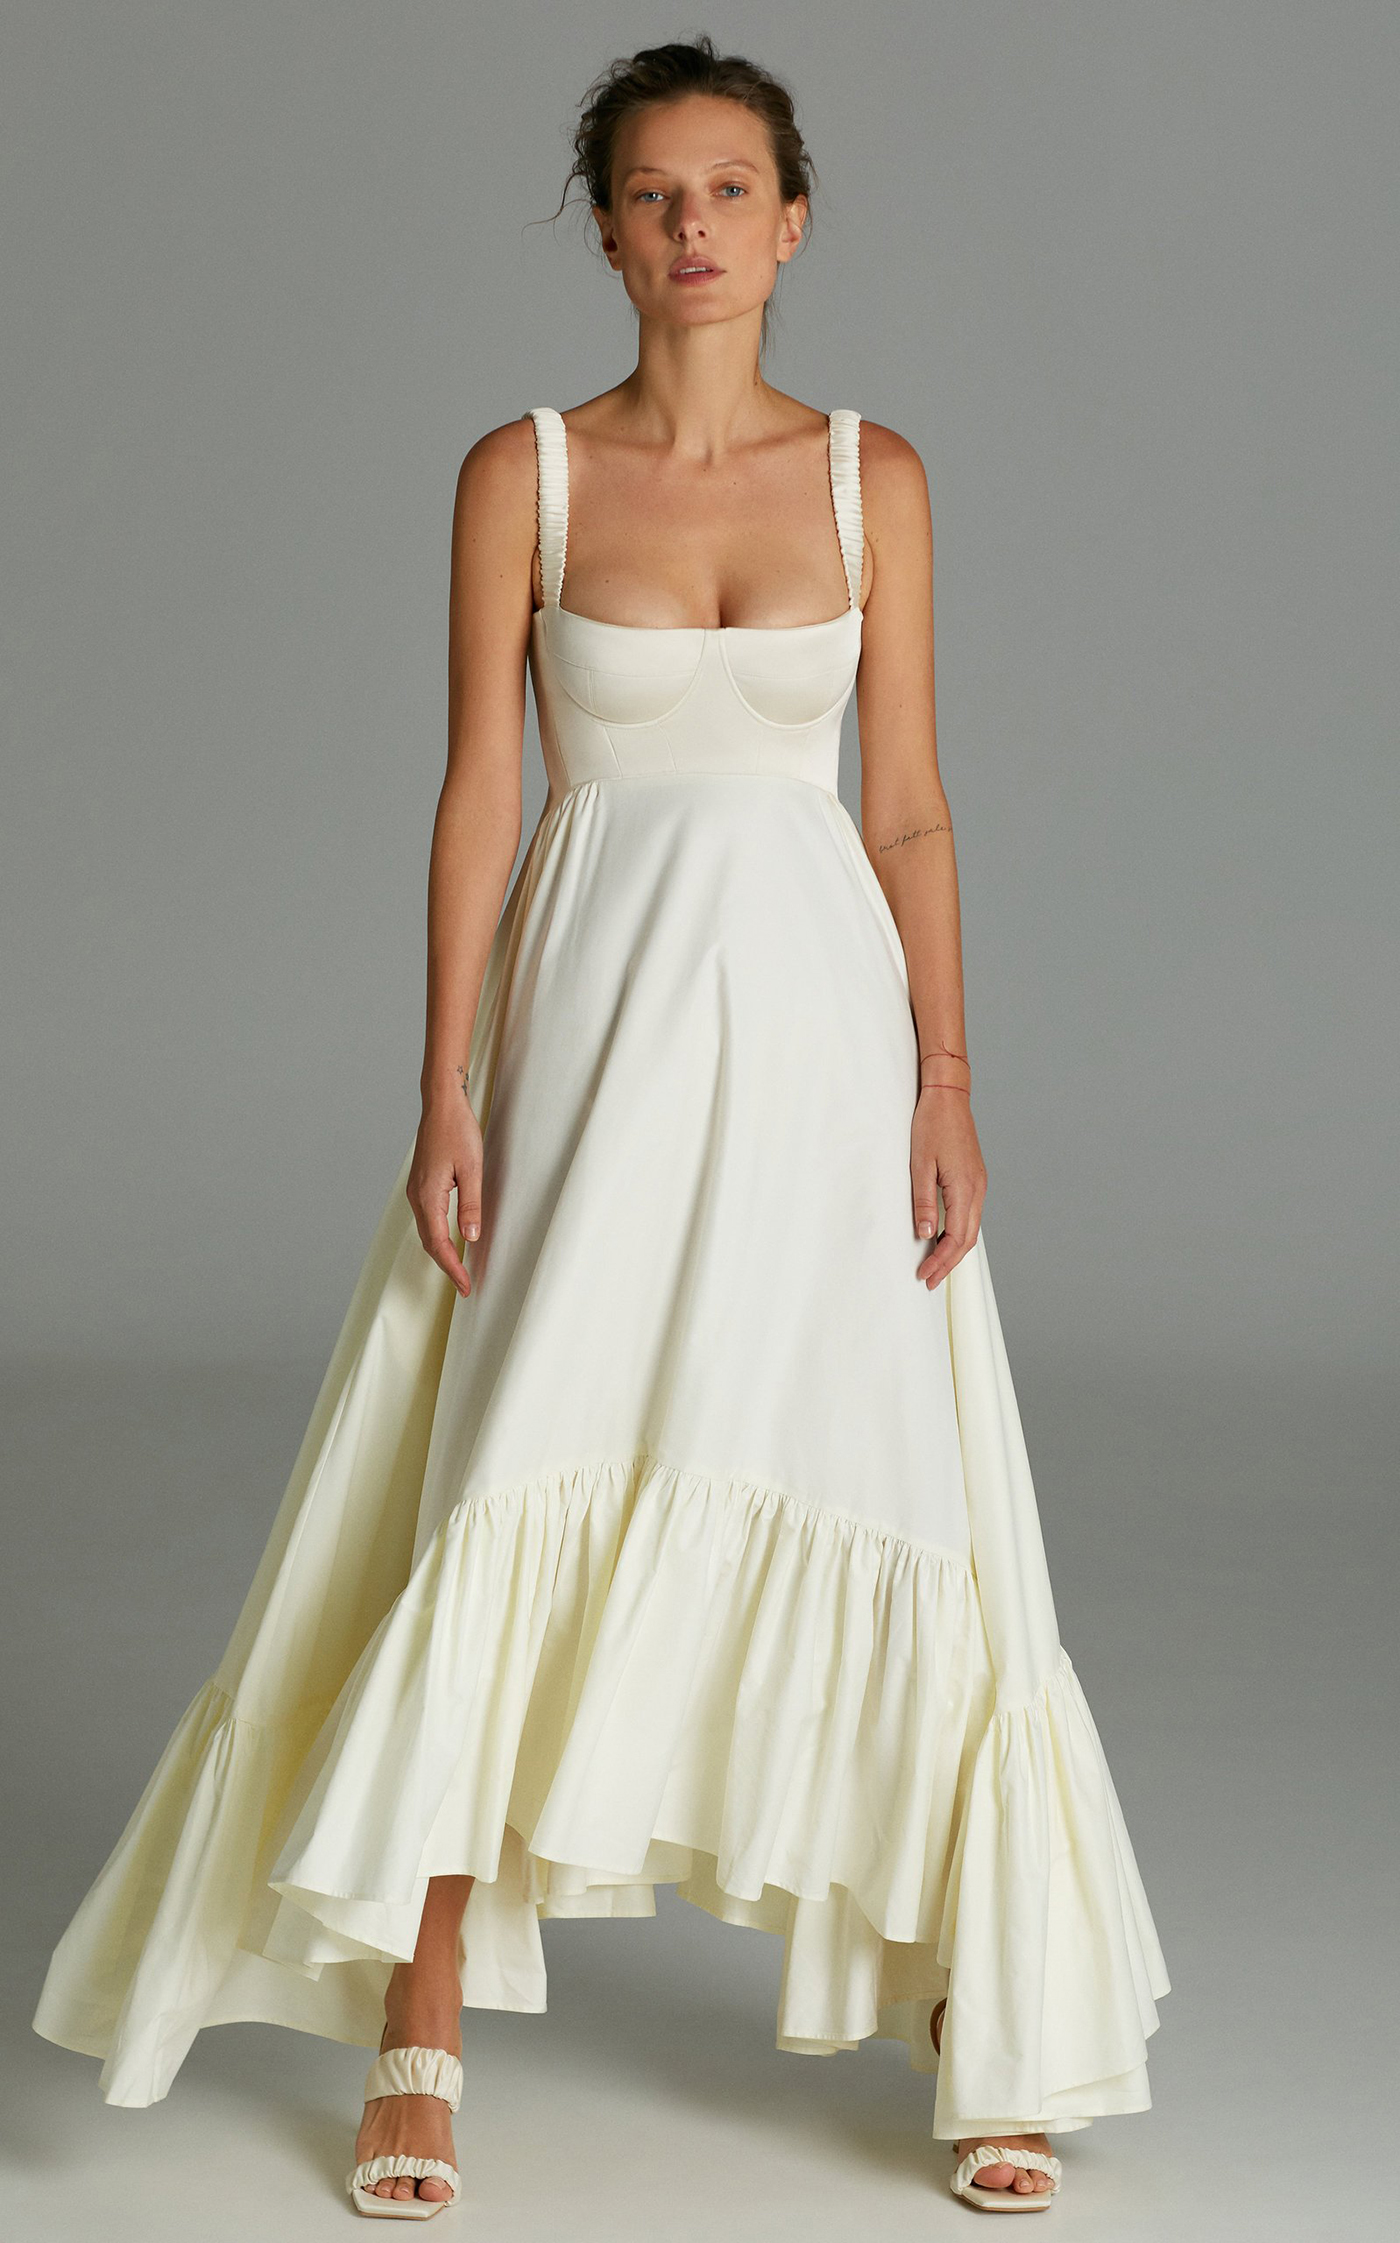 Regencycore wedding dresses